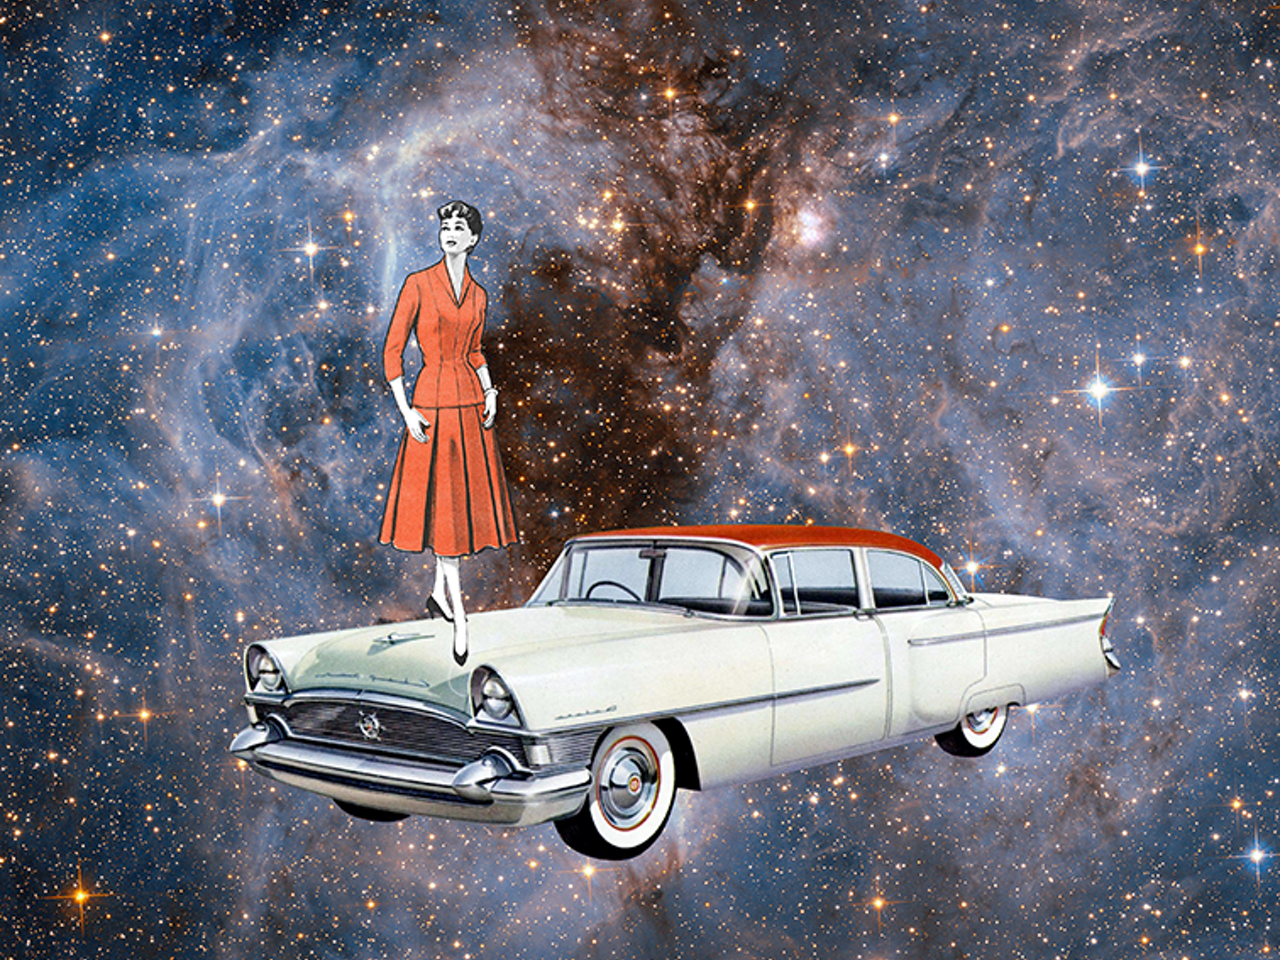 Autonomous car around the Universe